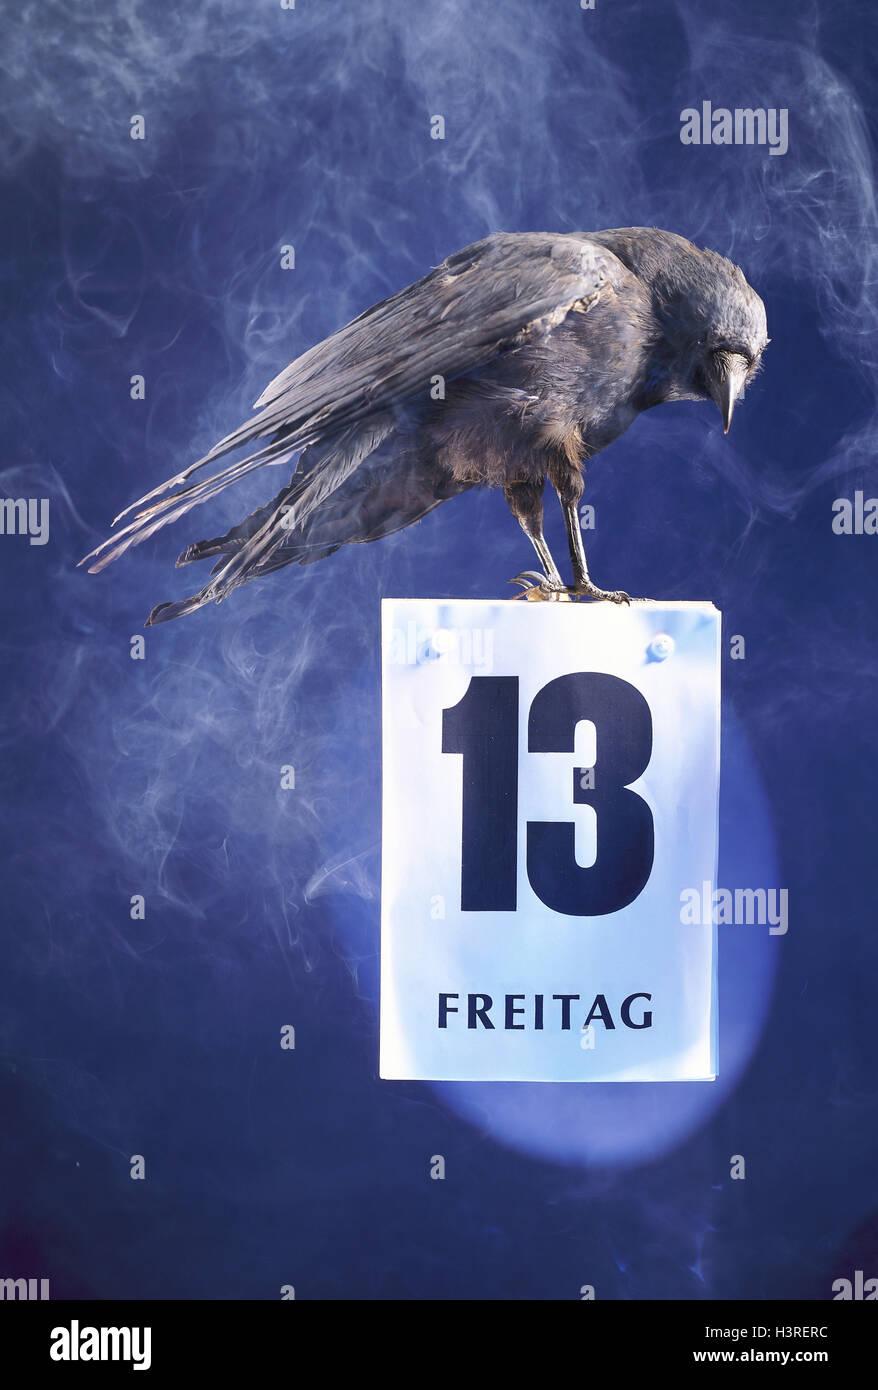 Aberglaube Unglück aberglaube kolkrabe kalender vögel freitag der 13 vogel rabe